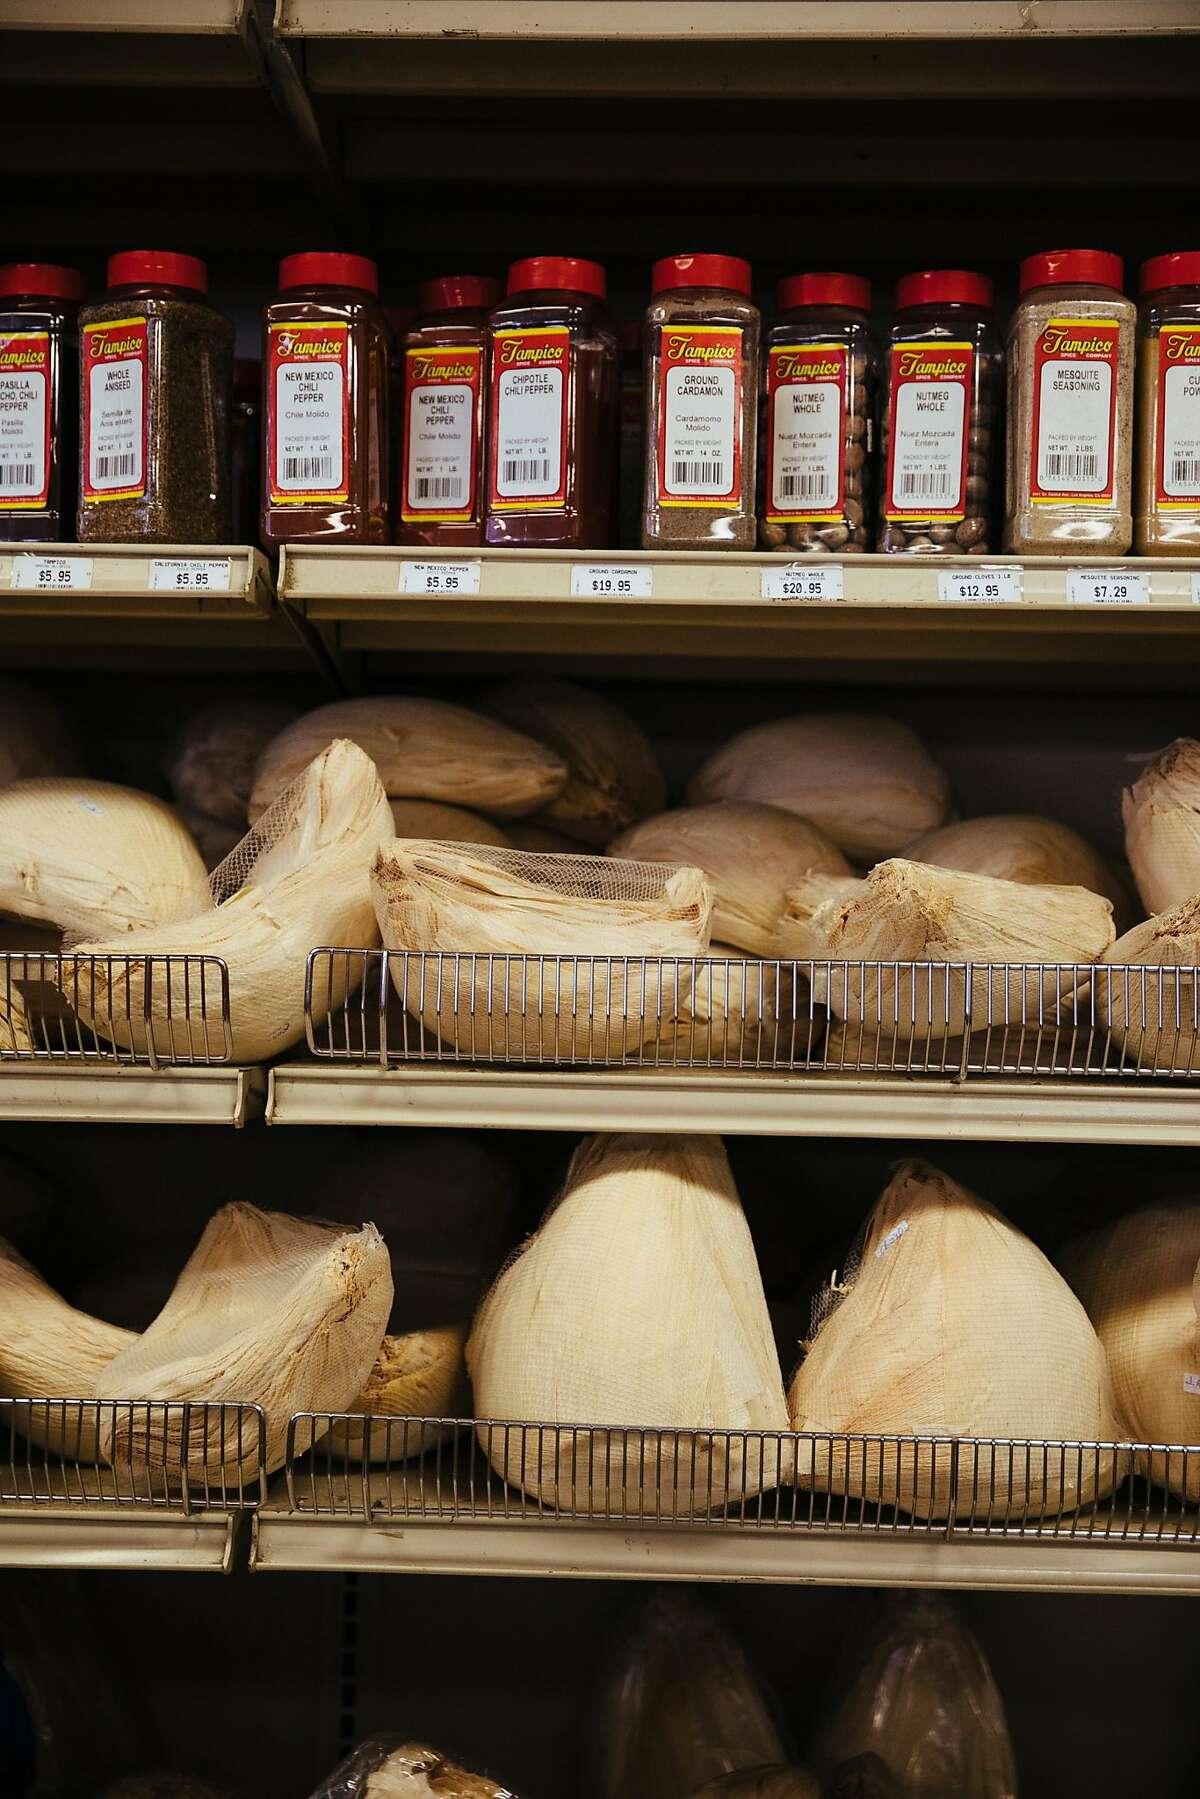 Corns husks for enchiladas are seen lining the shelves at La Esperanza Market in Sacramento, Calif. Tuesday, August 15, 2017.